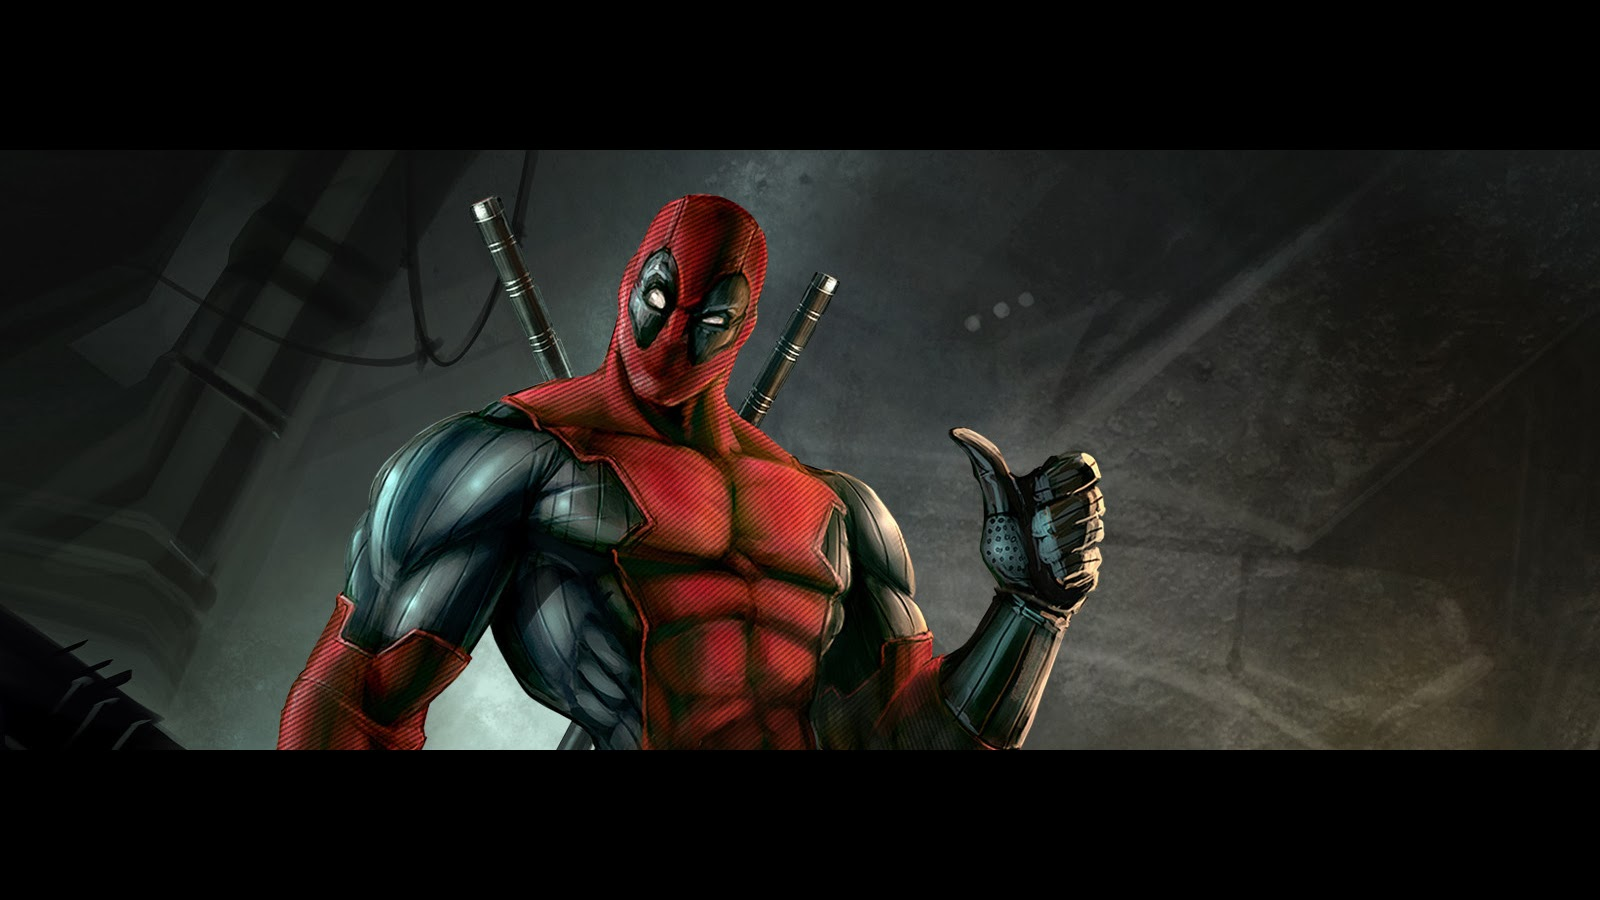 Deadpool movie wallpaper 1080p wallpapersafari - Deadpool download 1080p ...